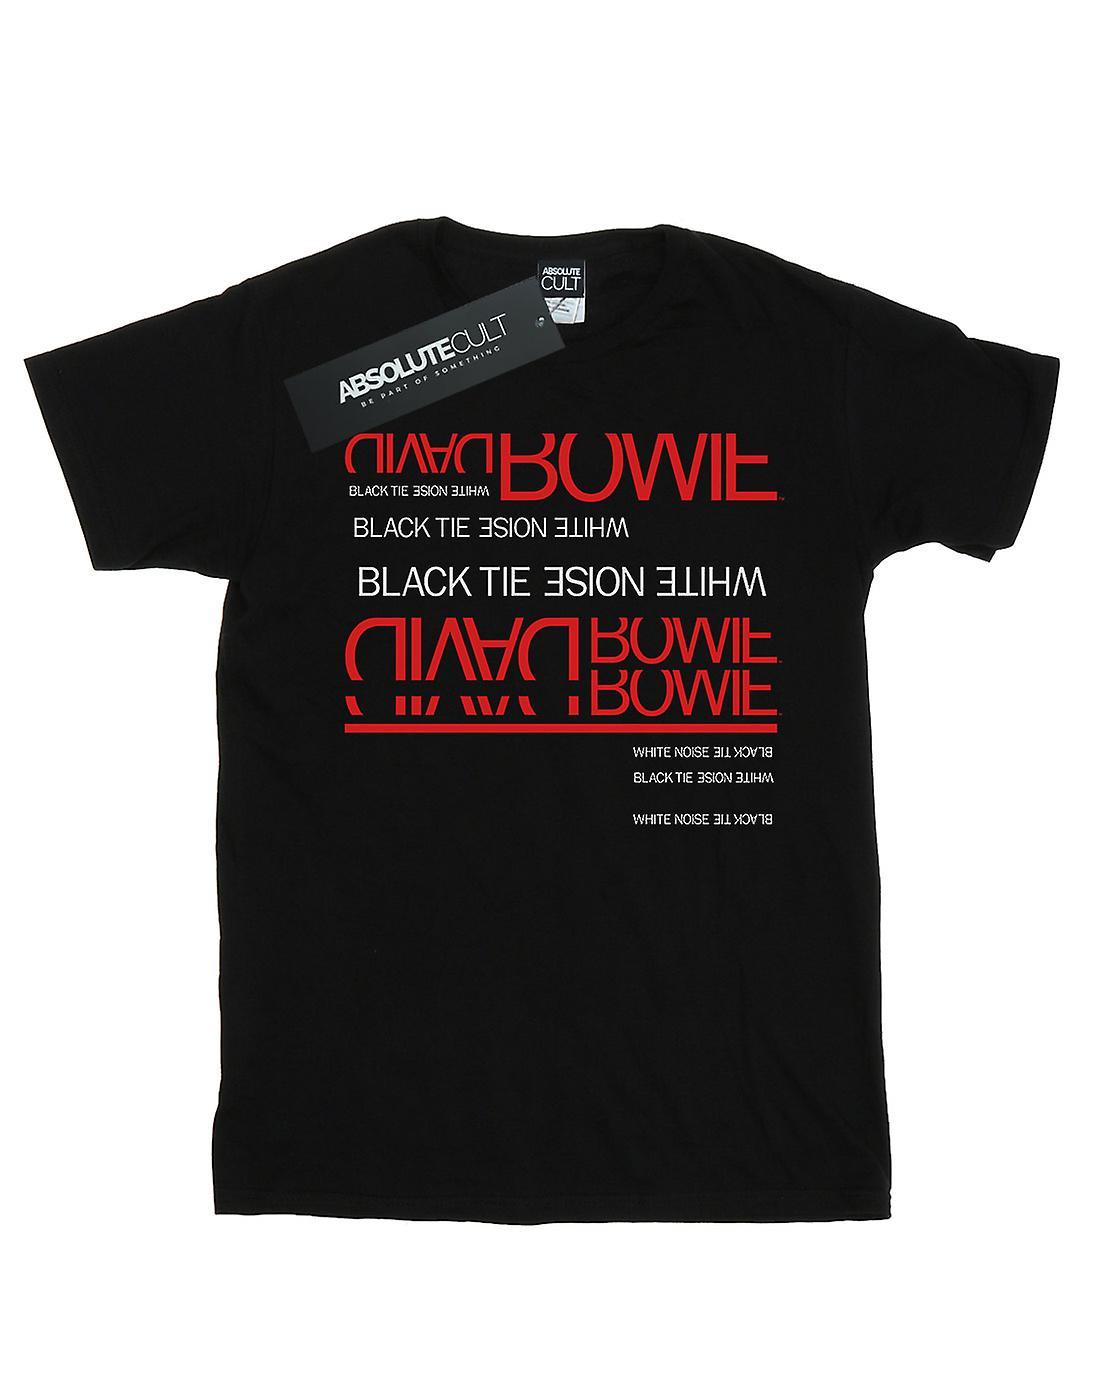 David Bowie Women's Black Tie White Noise Boyfriend Fit T-Shirt